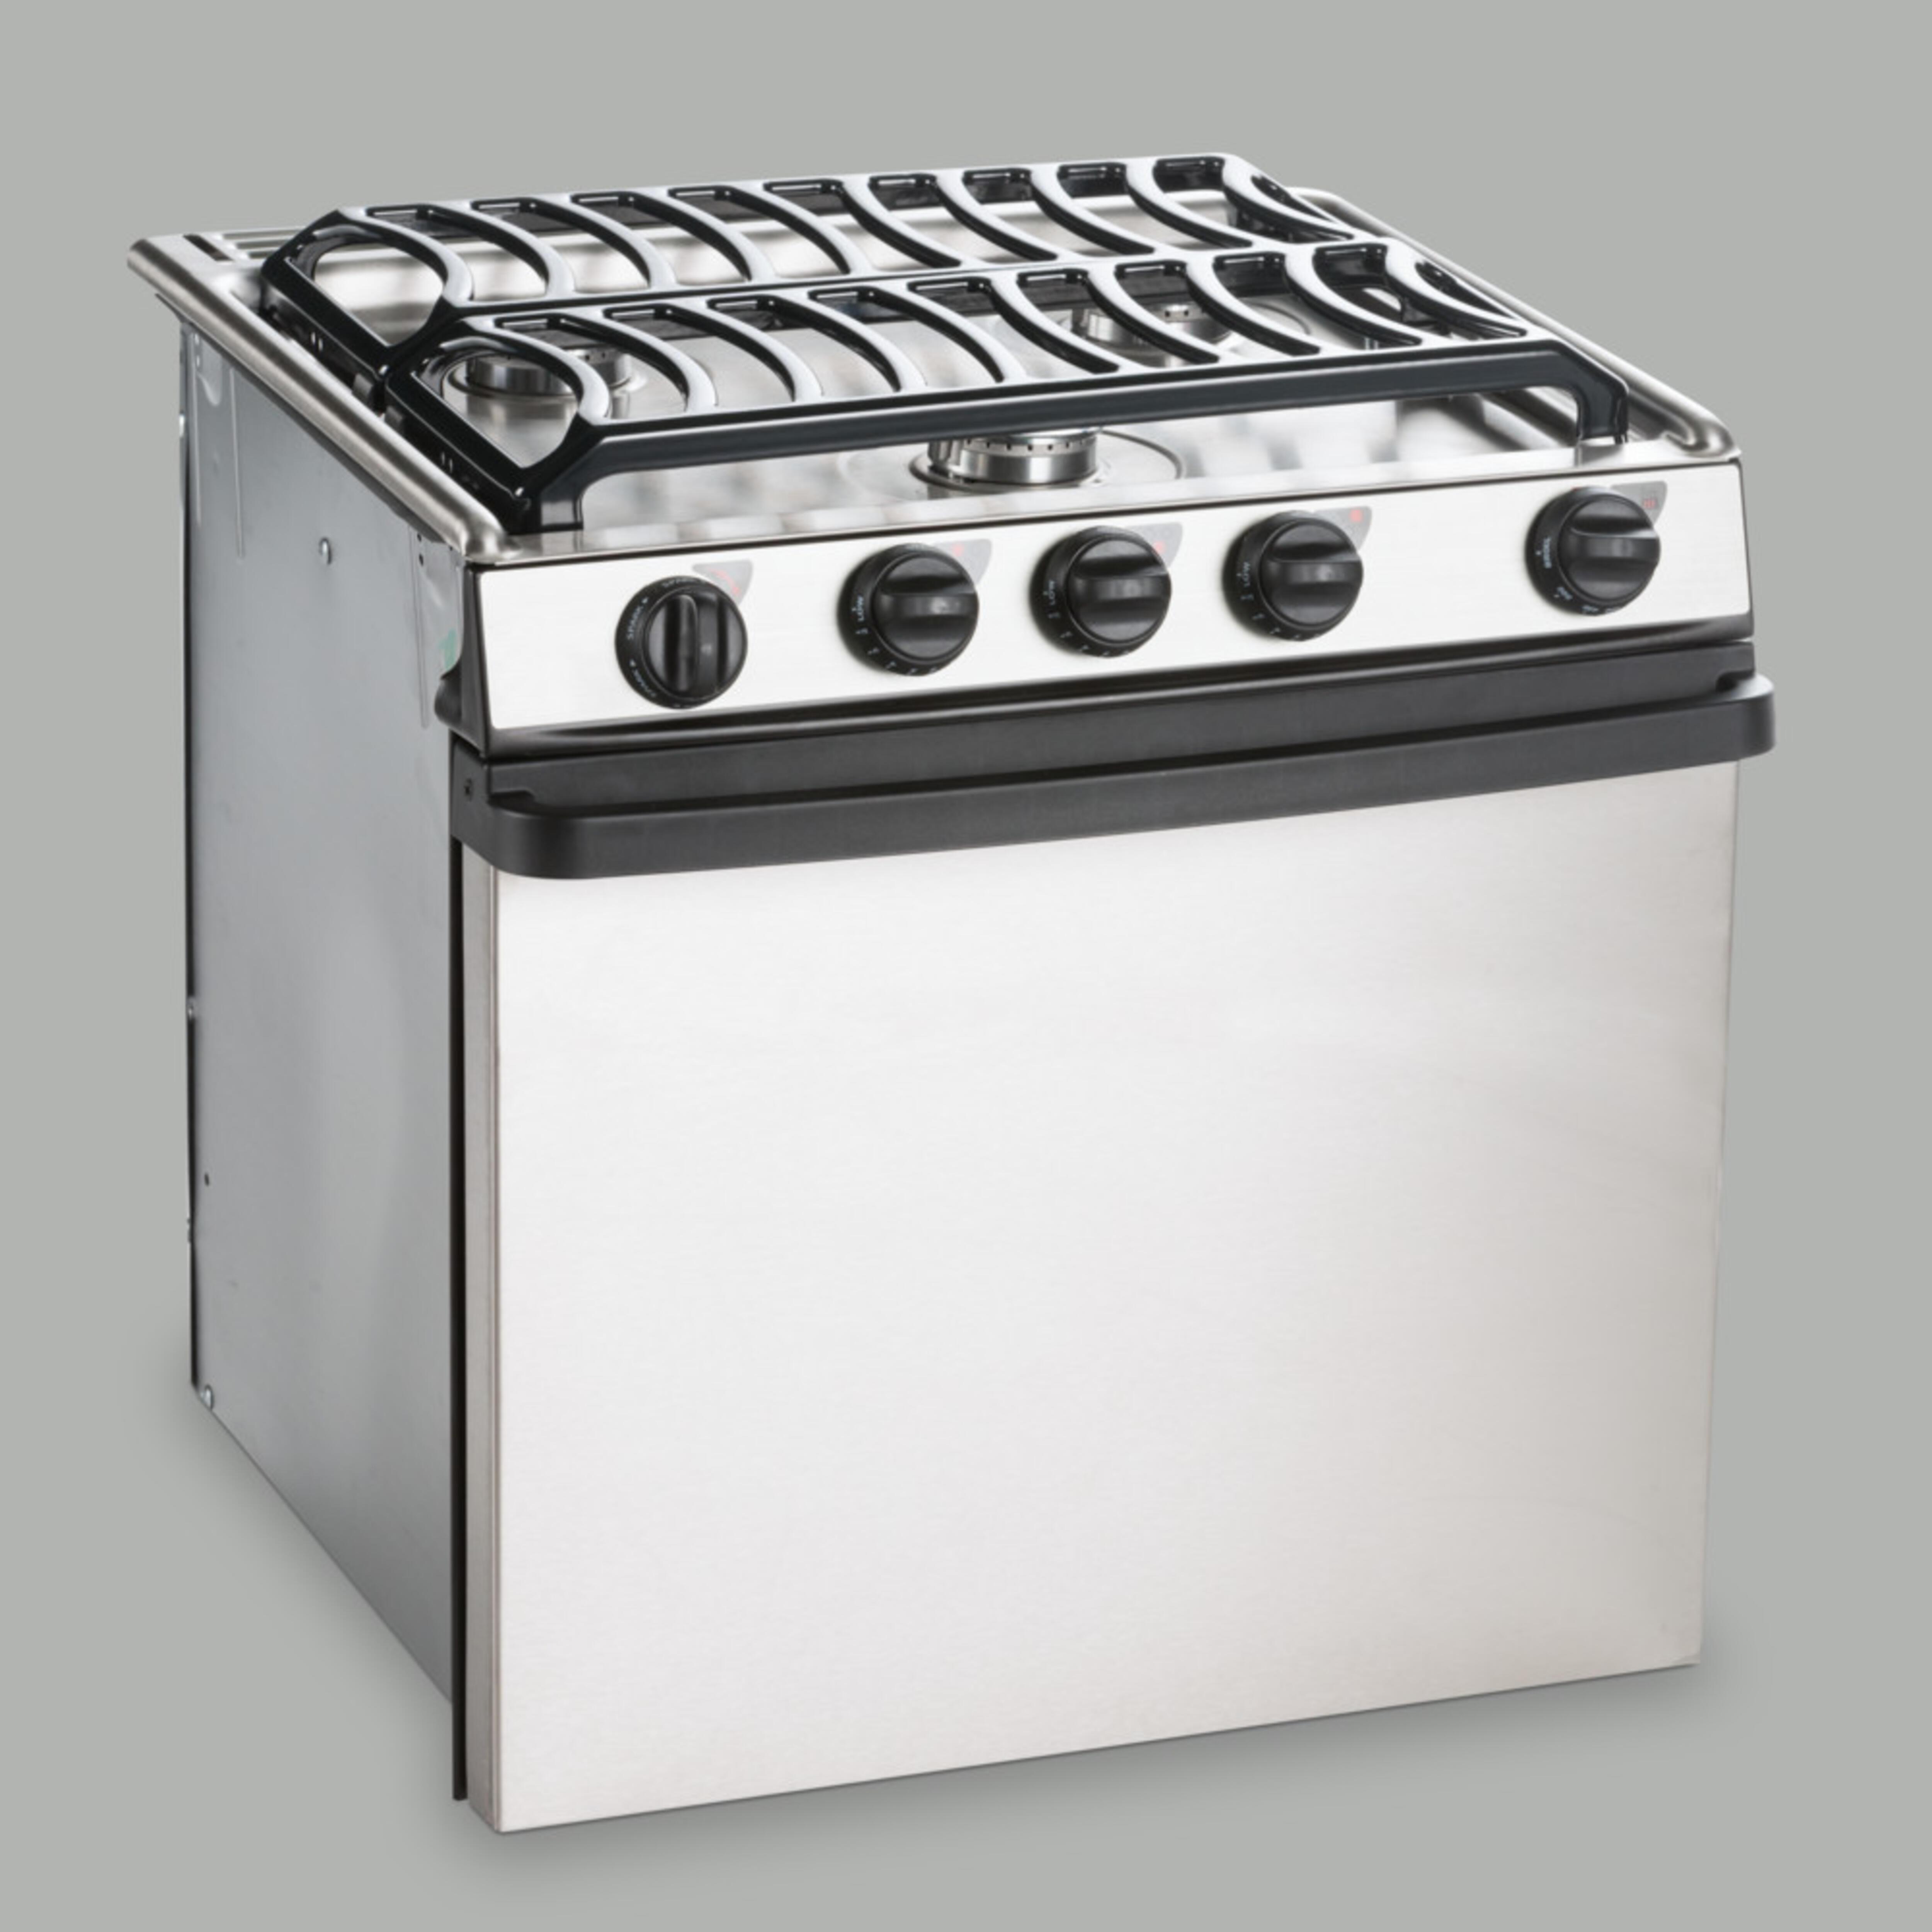 Dometic Atwood 3-Burner Range